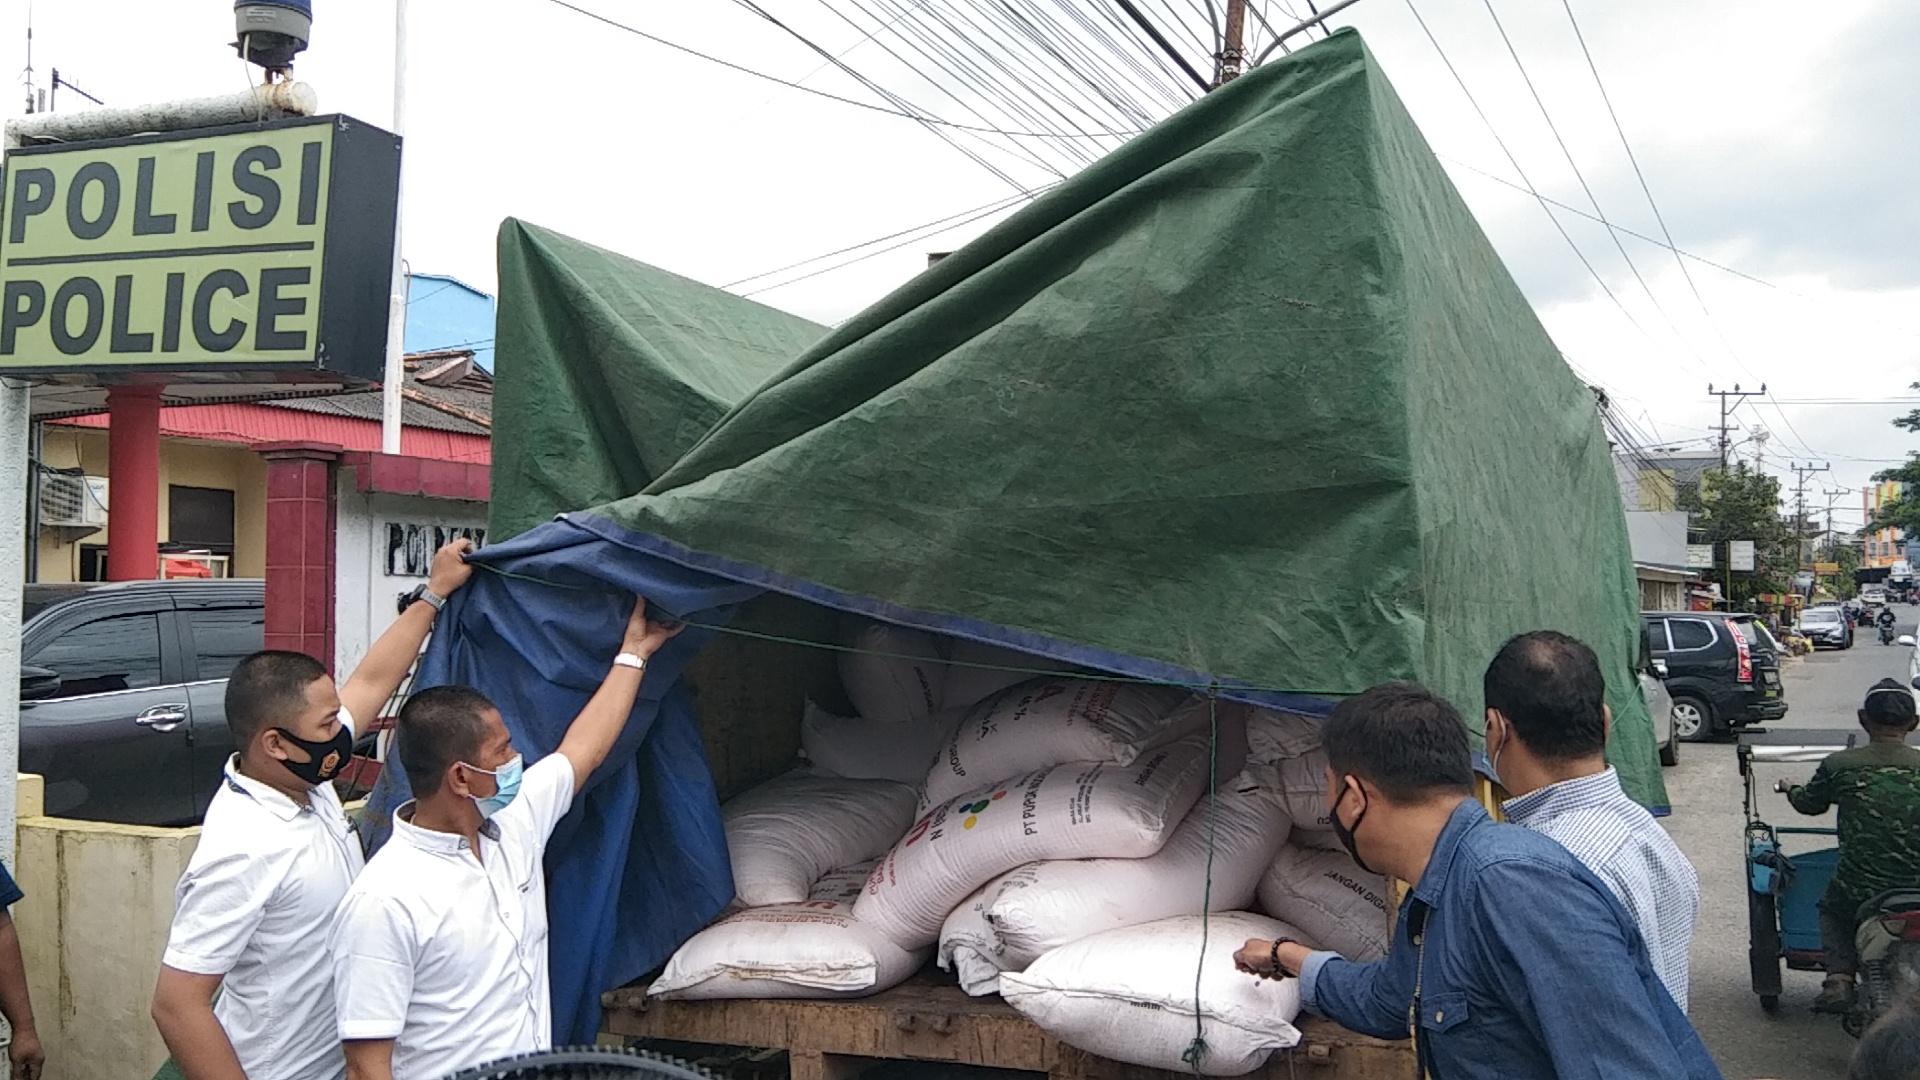 Truk muatan pupuk PT Pusri ditemukan di kawasan Rambutan Banyuasin Sumsel (Dede Febryansyah / Mattanews.co)